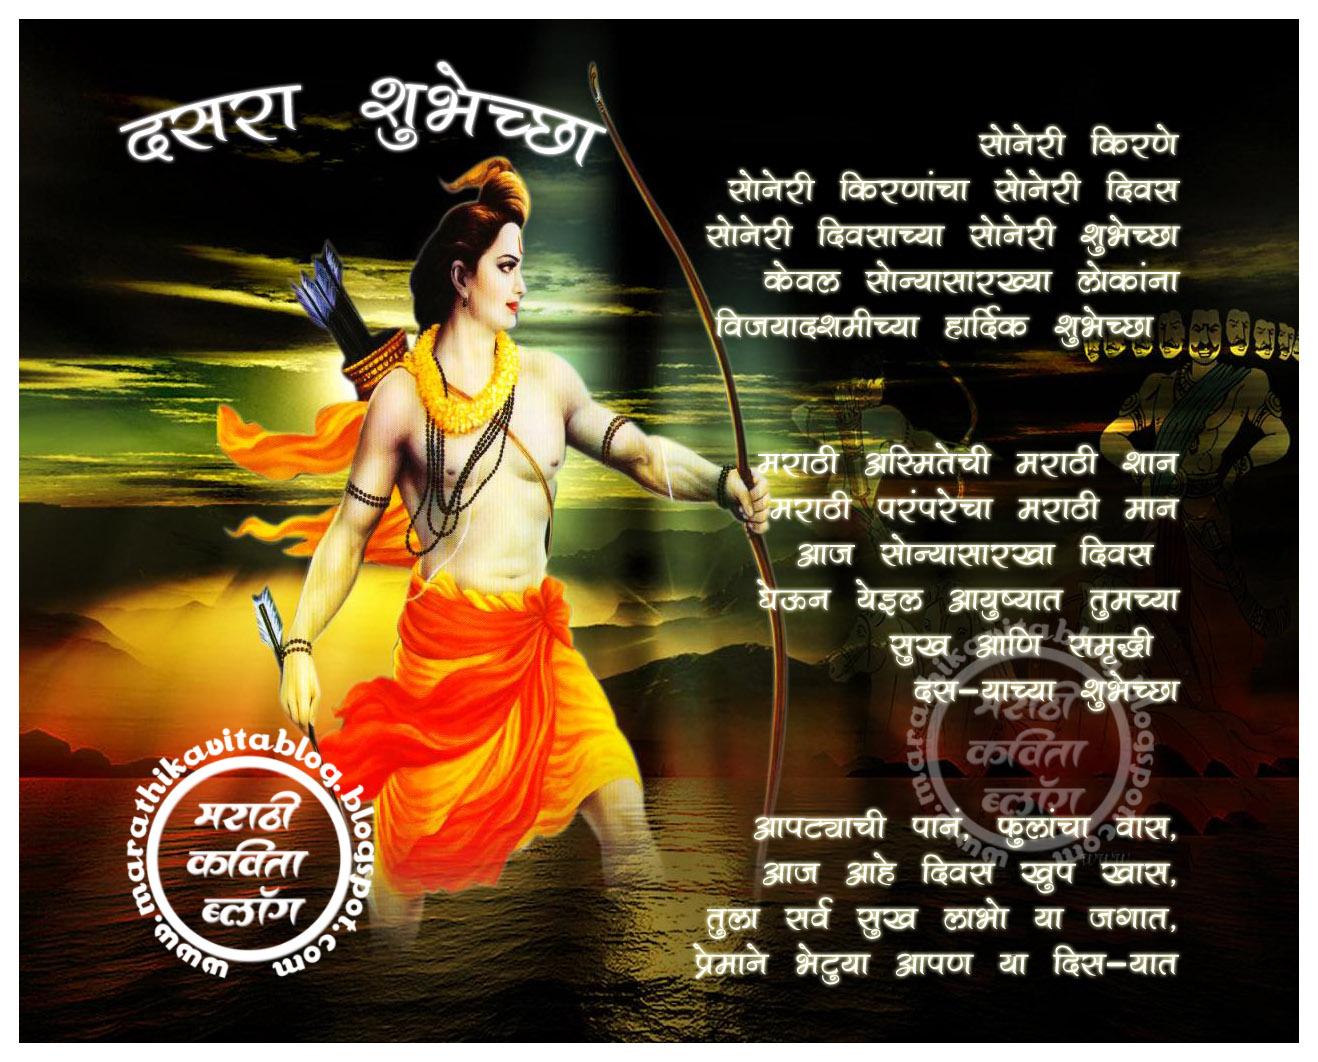 Pin Diwalichya Hardik Shubhechha Cover Wallpaper Wallpaper on ... Vadhdivas Chya Hardik Shubhechha Hd